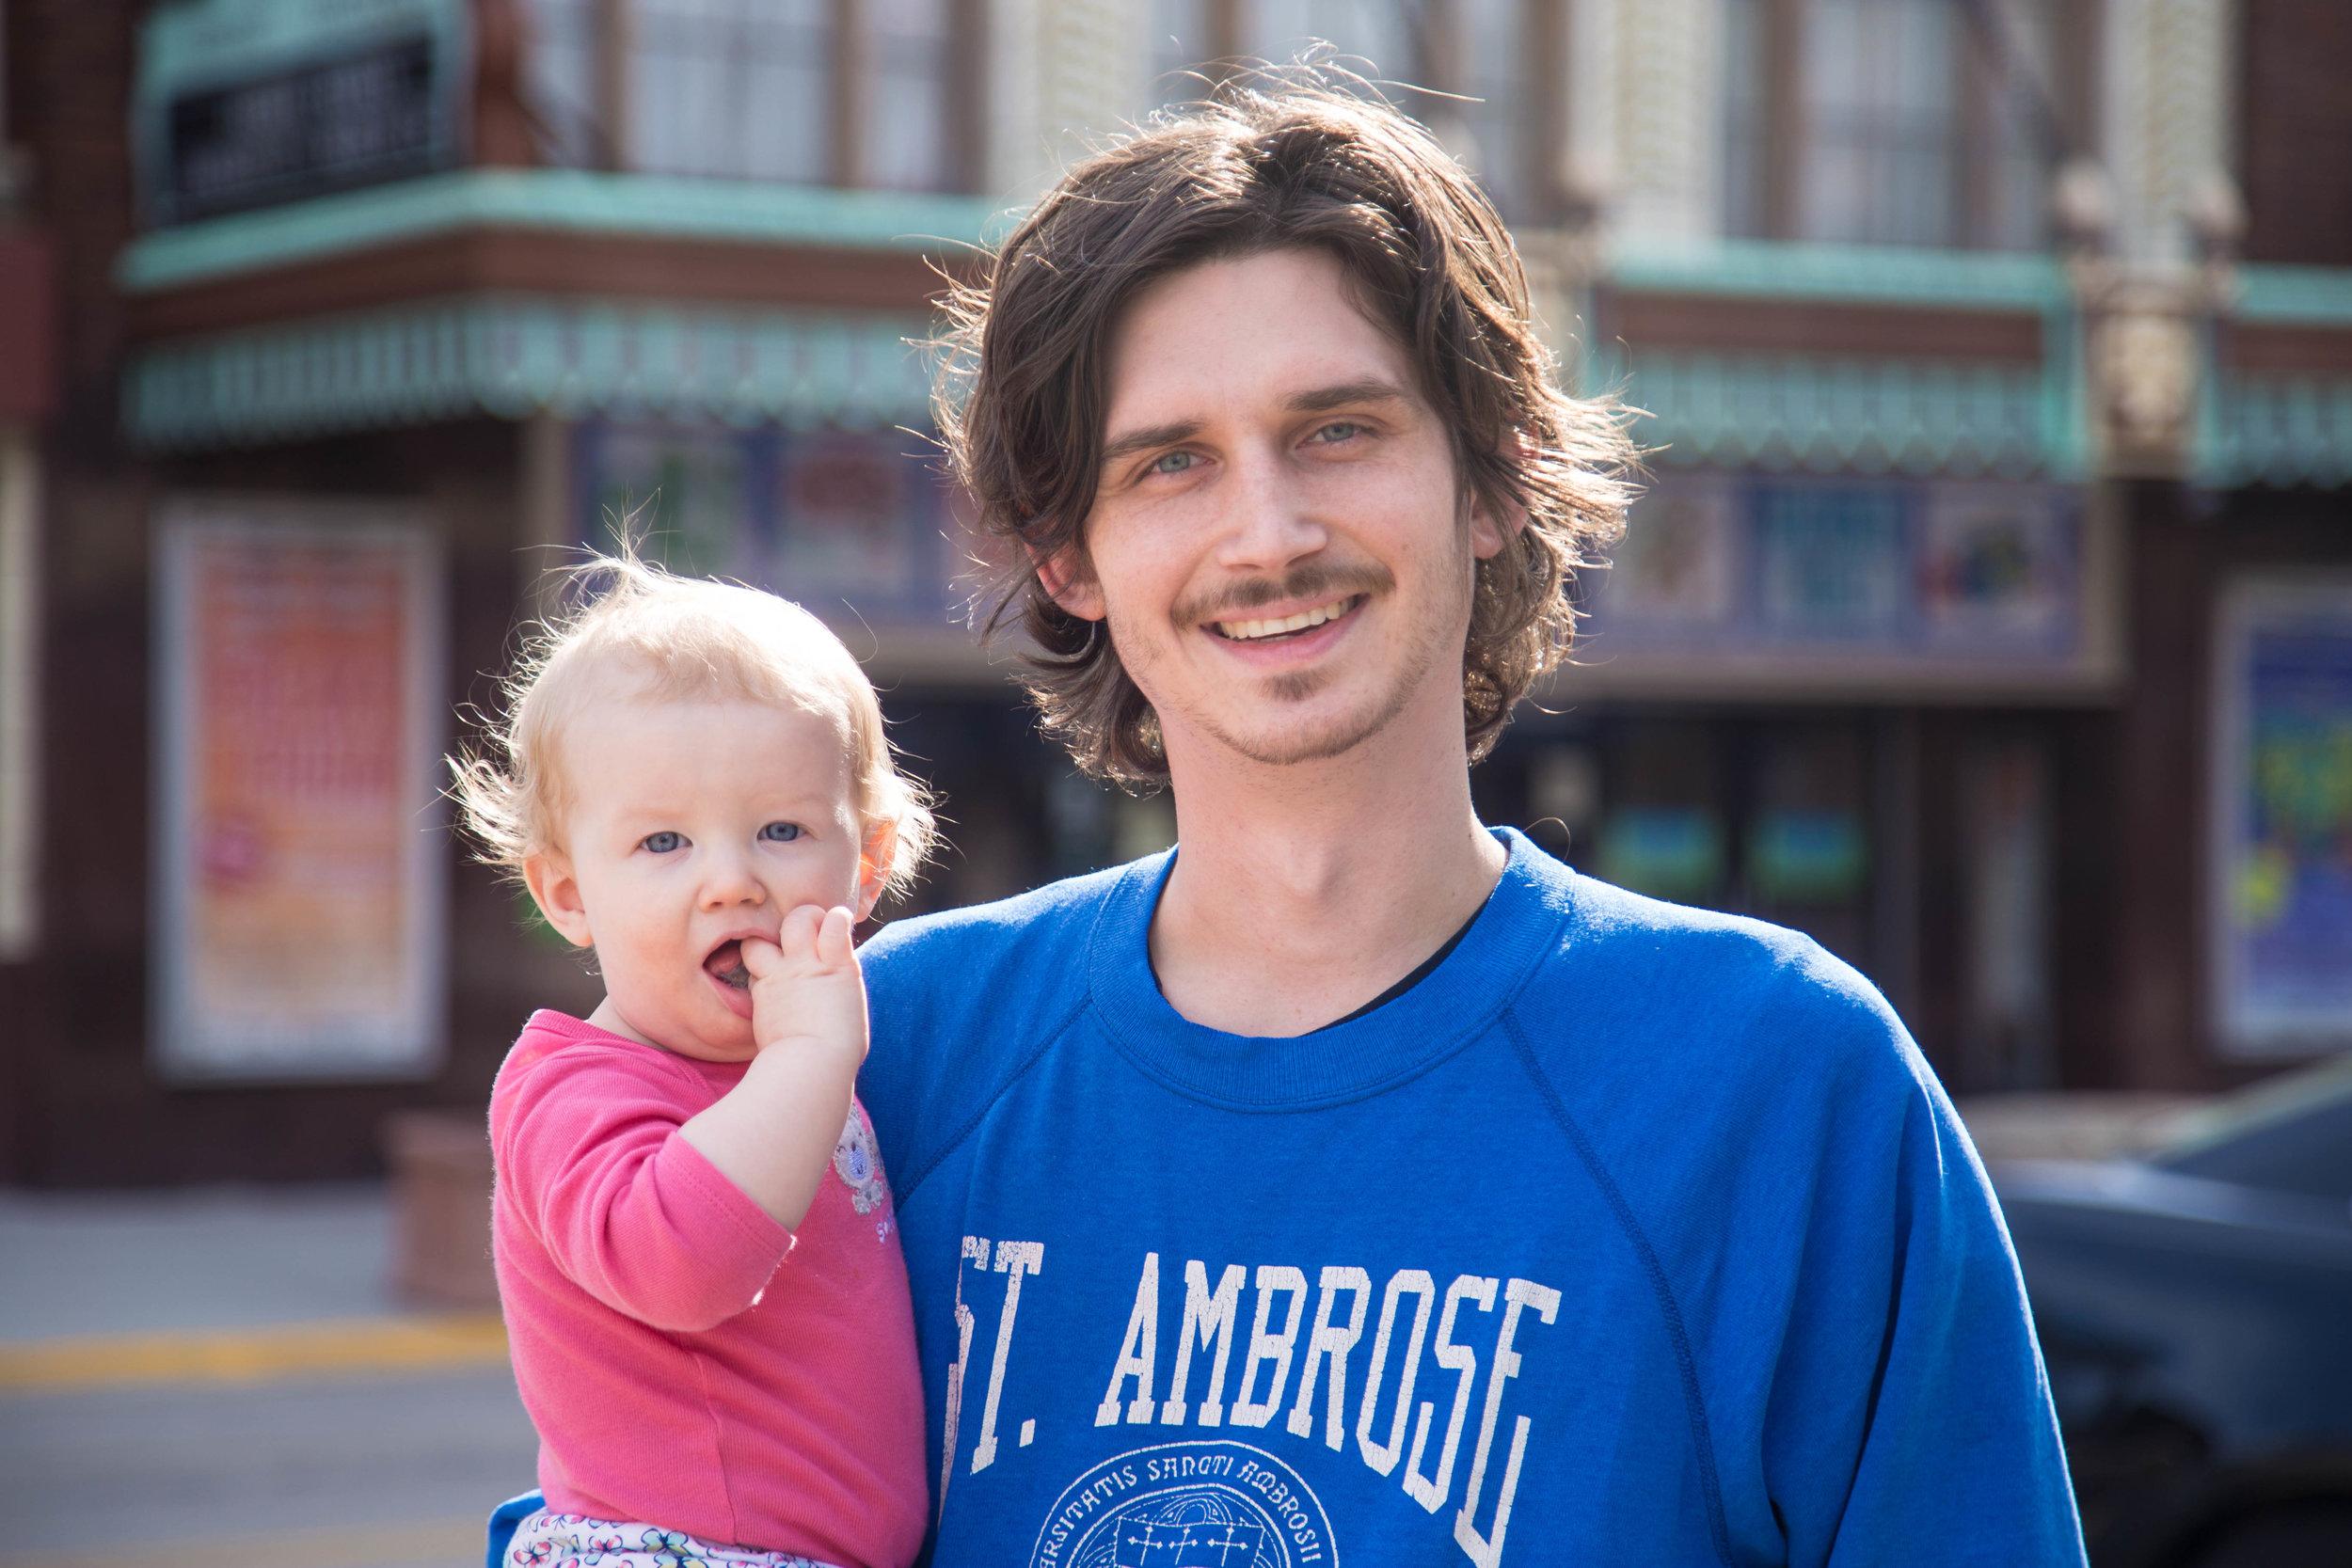 Rock Island Alderman Dylan Parker holds his daughter Antigone in their home 5th Ward. (One Illinois/Zach Sigelko)